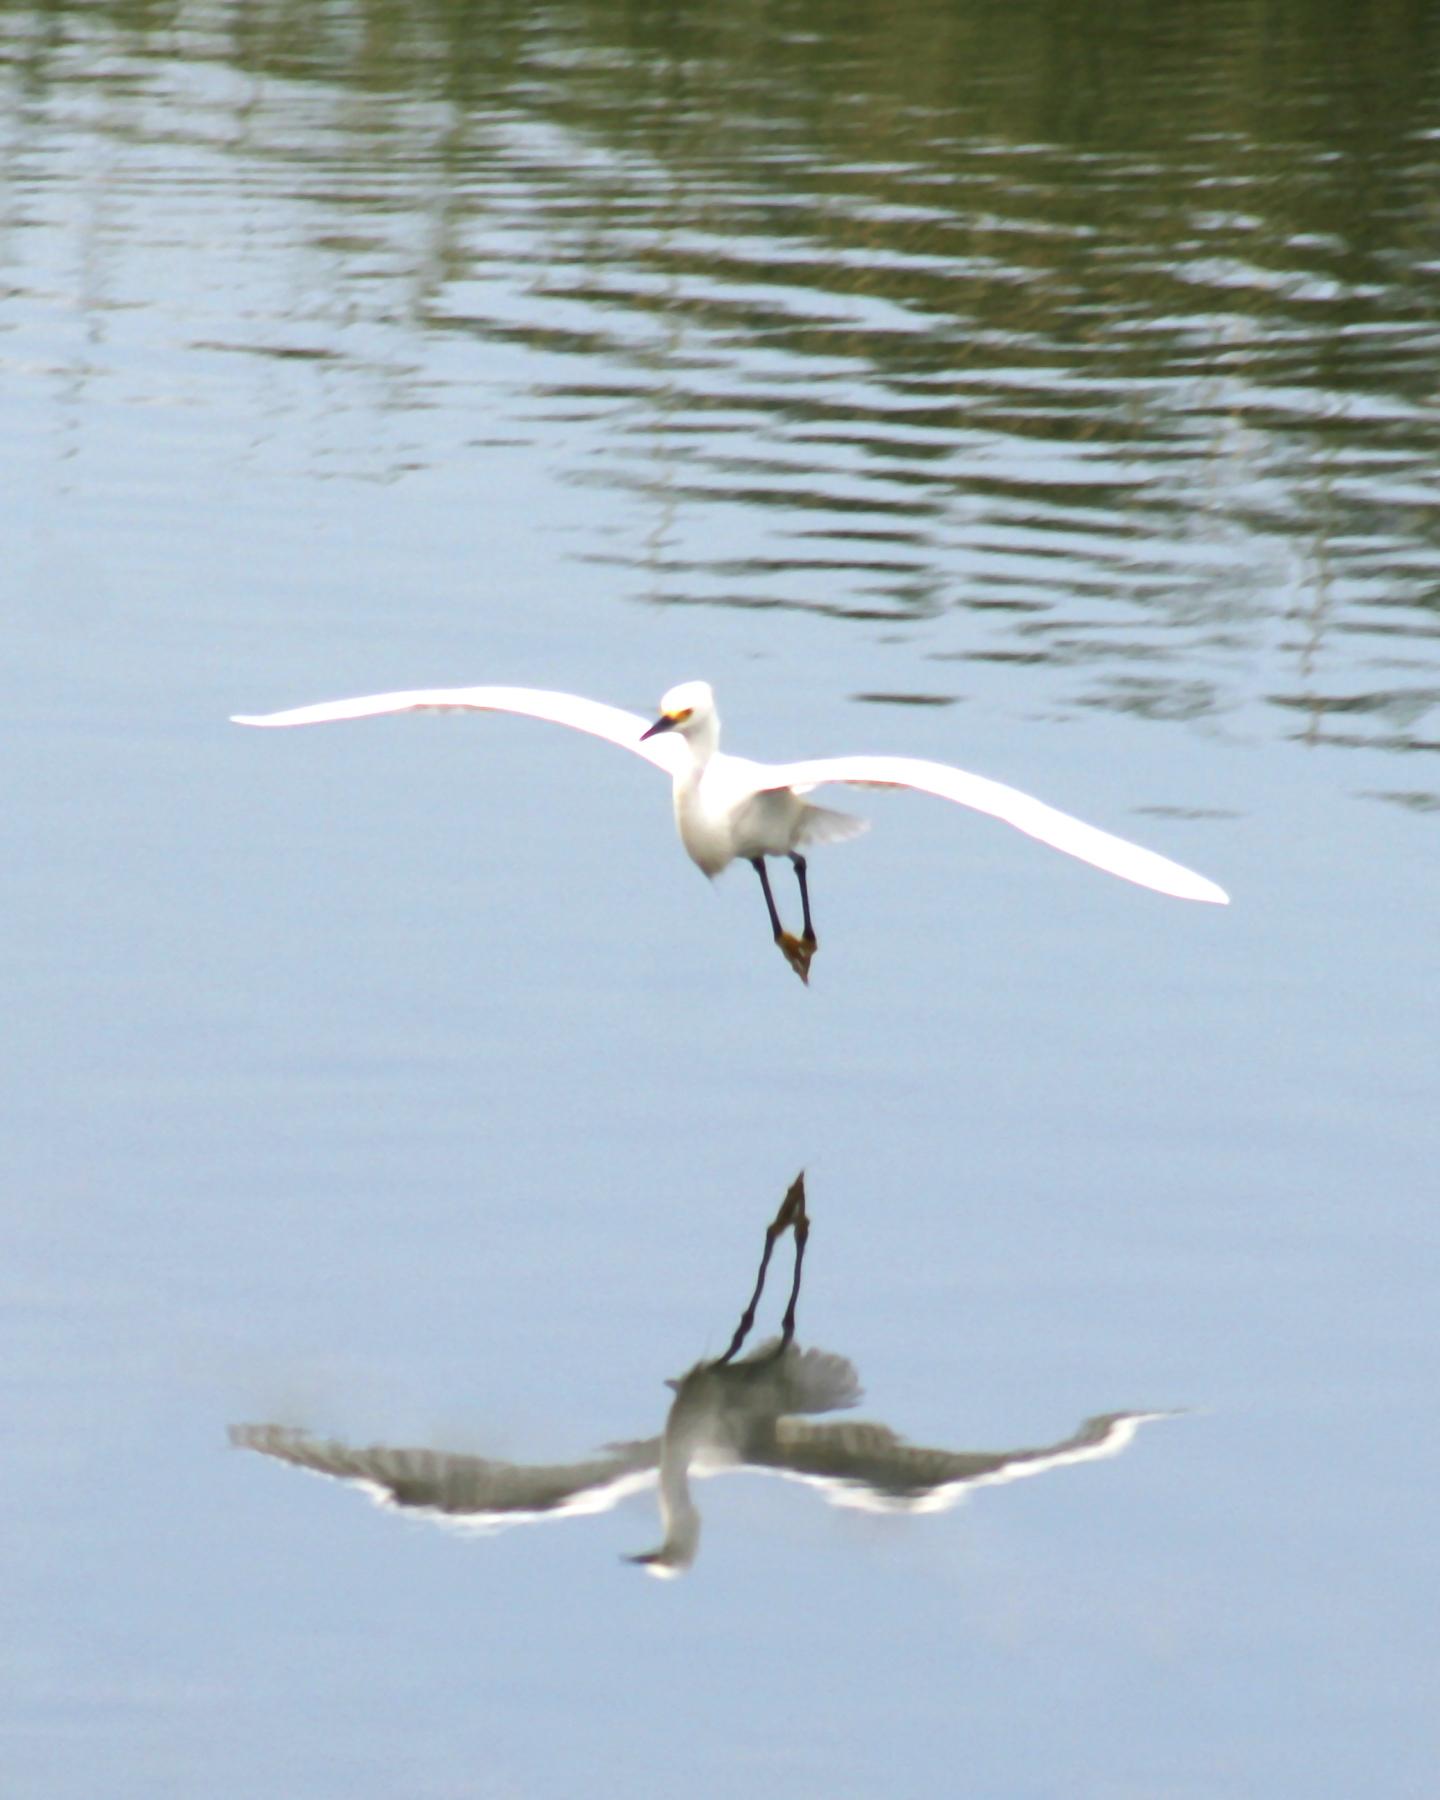 ed 212 fliped Heron 8x10v_3535 copy 2.jpg